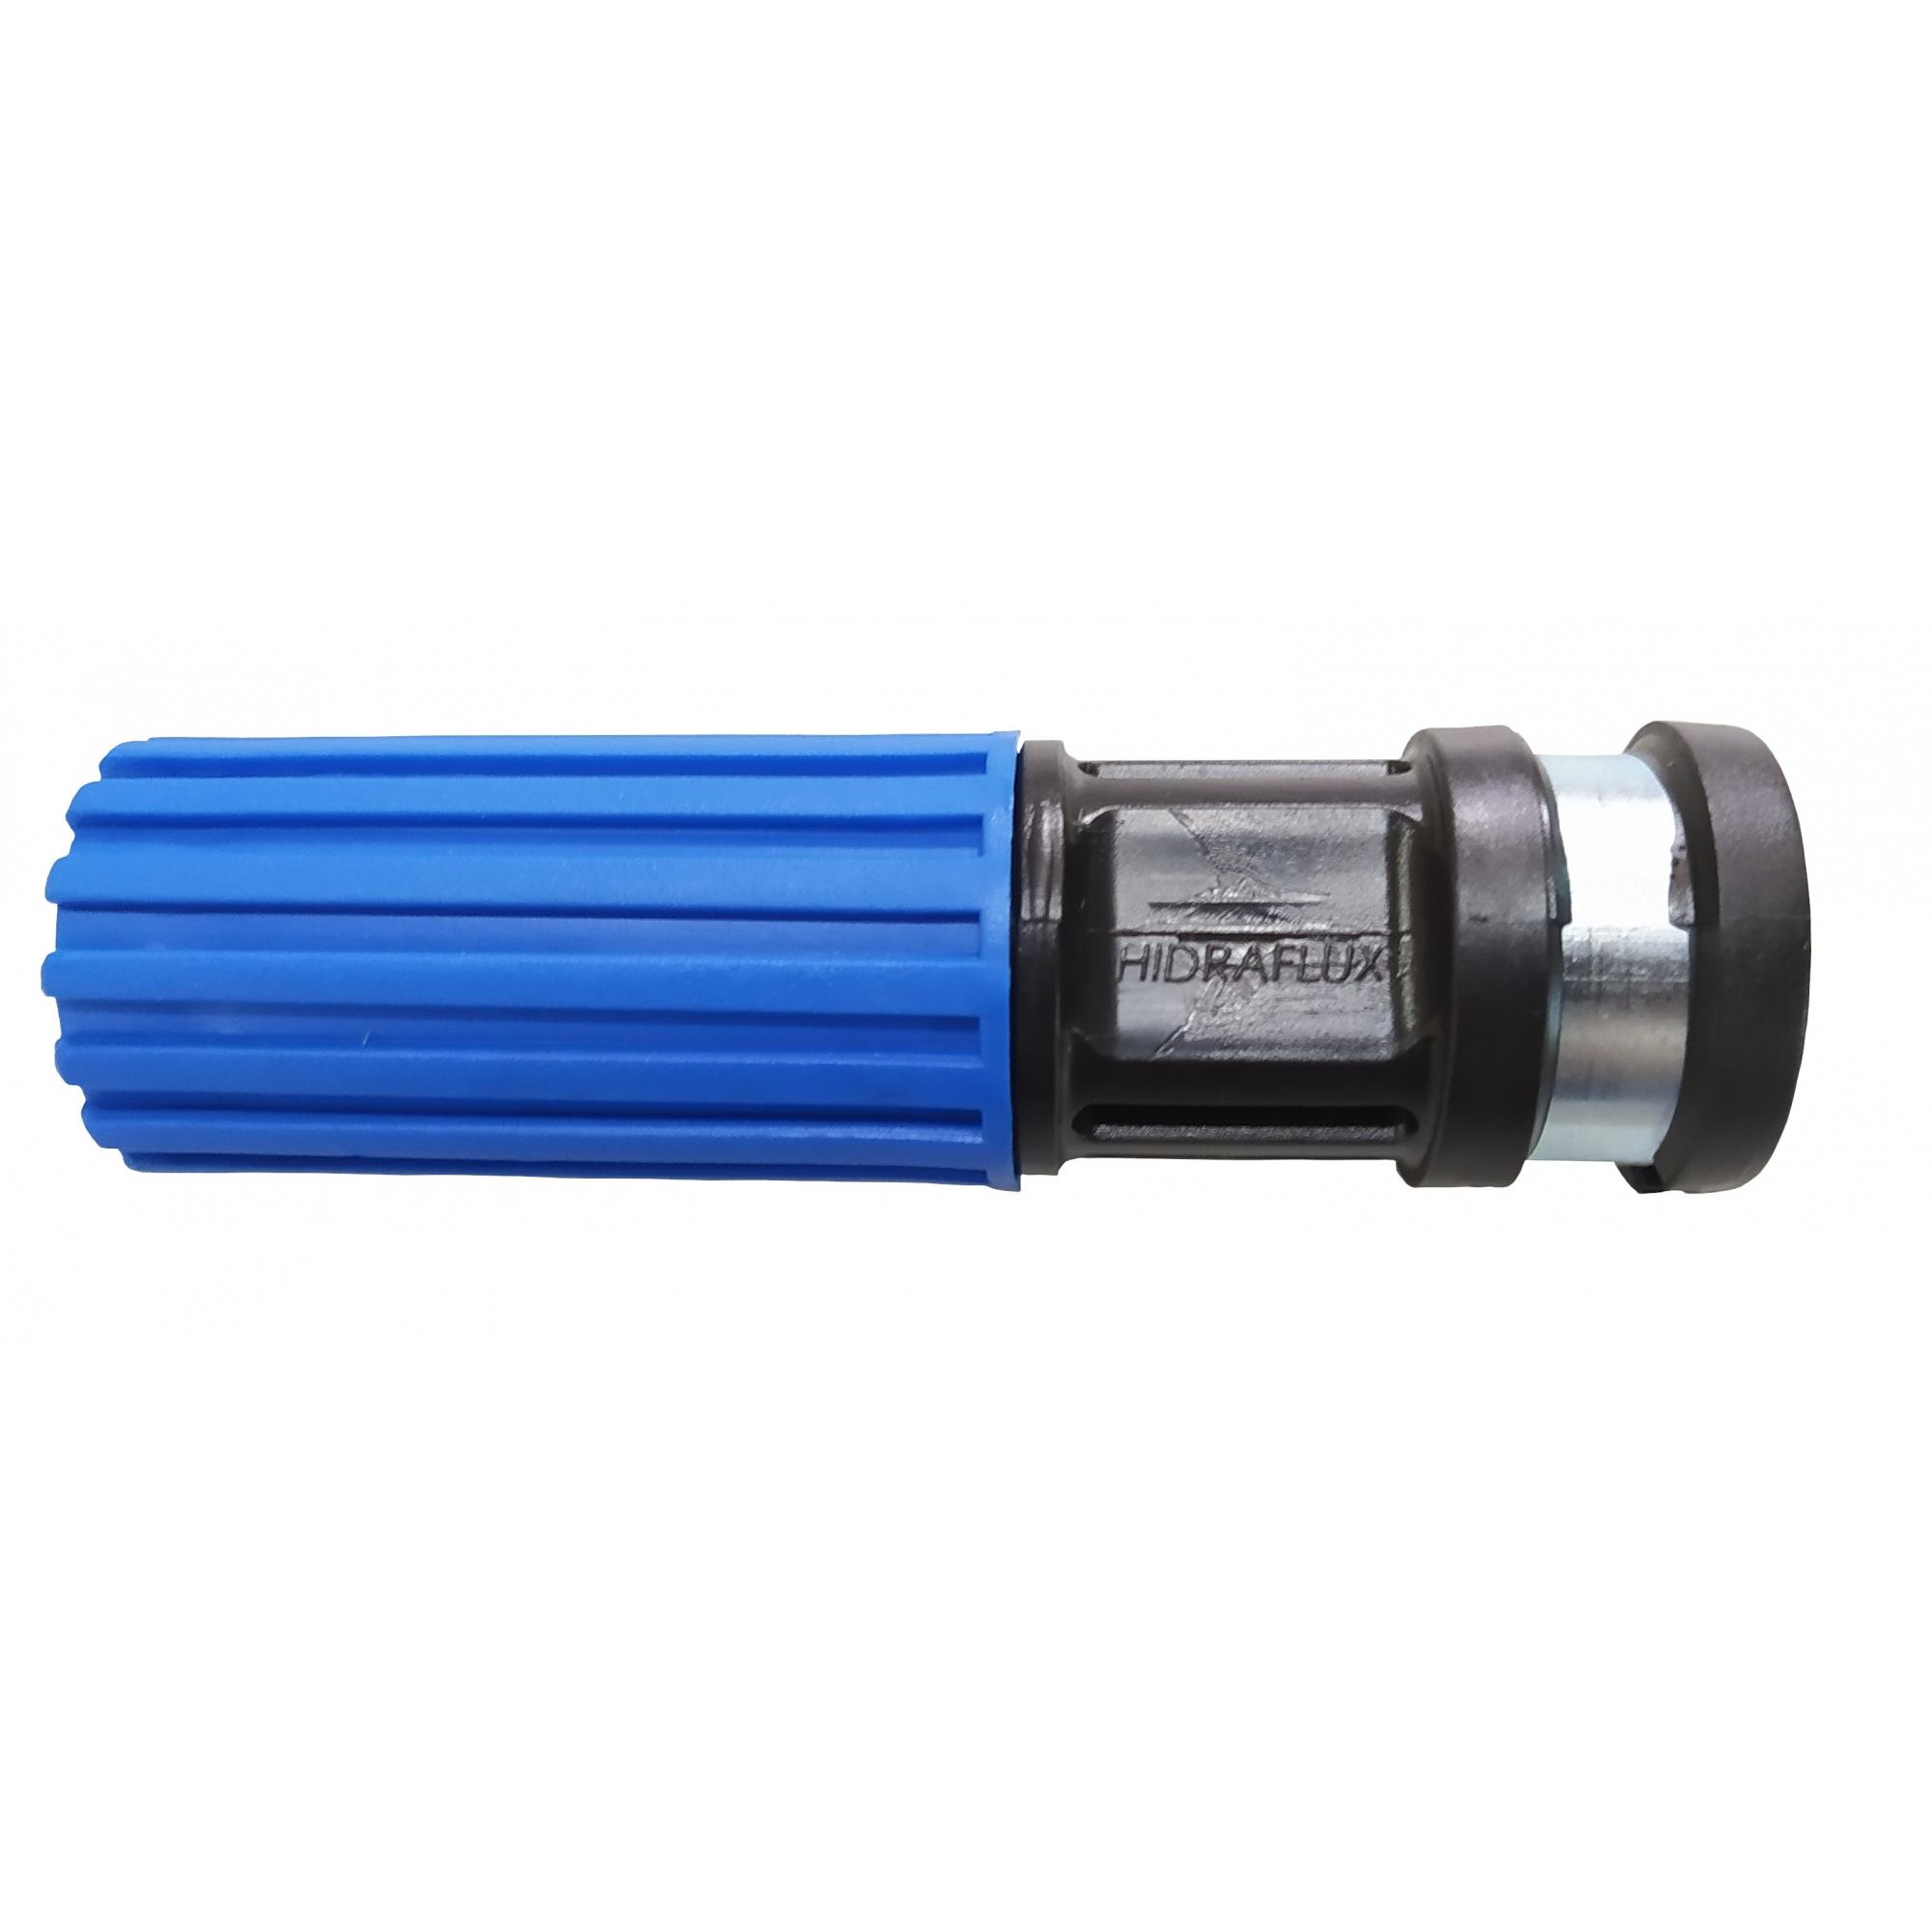 Esguicho Bico Regulavel Lava Jato Auto 1/2 Saída 4,6mm Azul Hidraflux